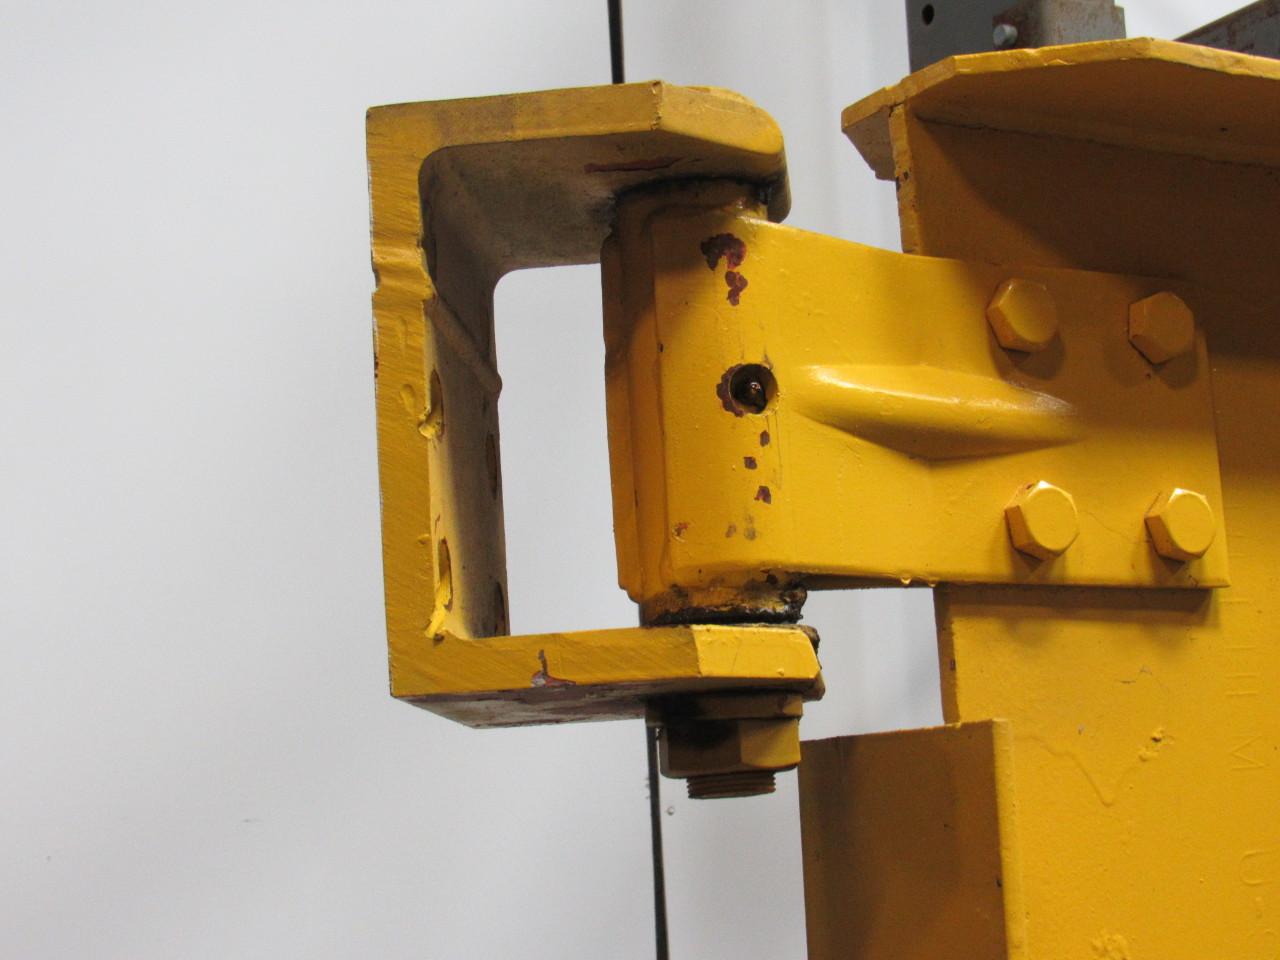 Motorized Wall Mounted Jib Crane : Cleveland beacon ton cantilever jib crane span wall